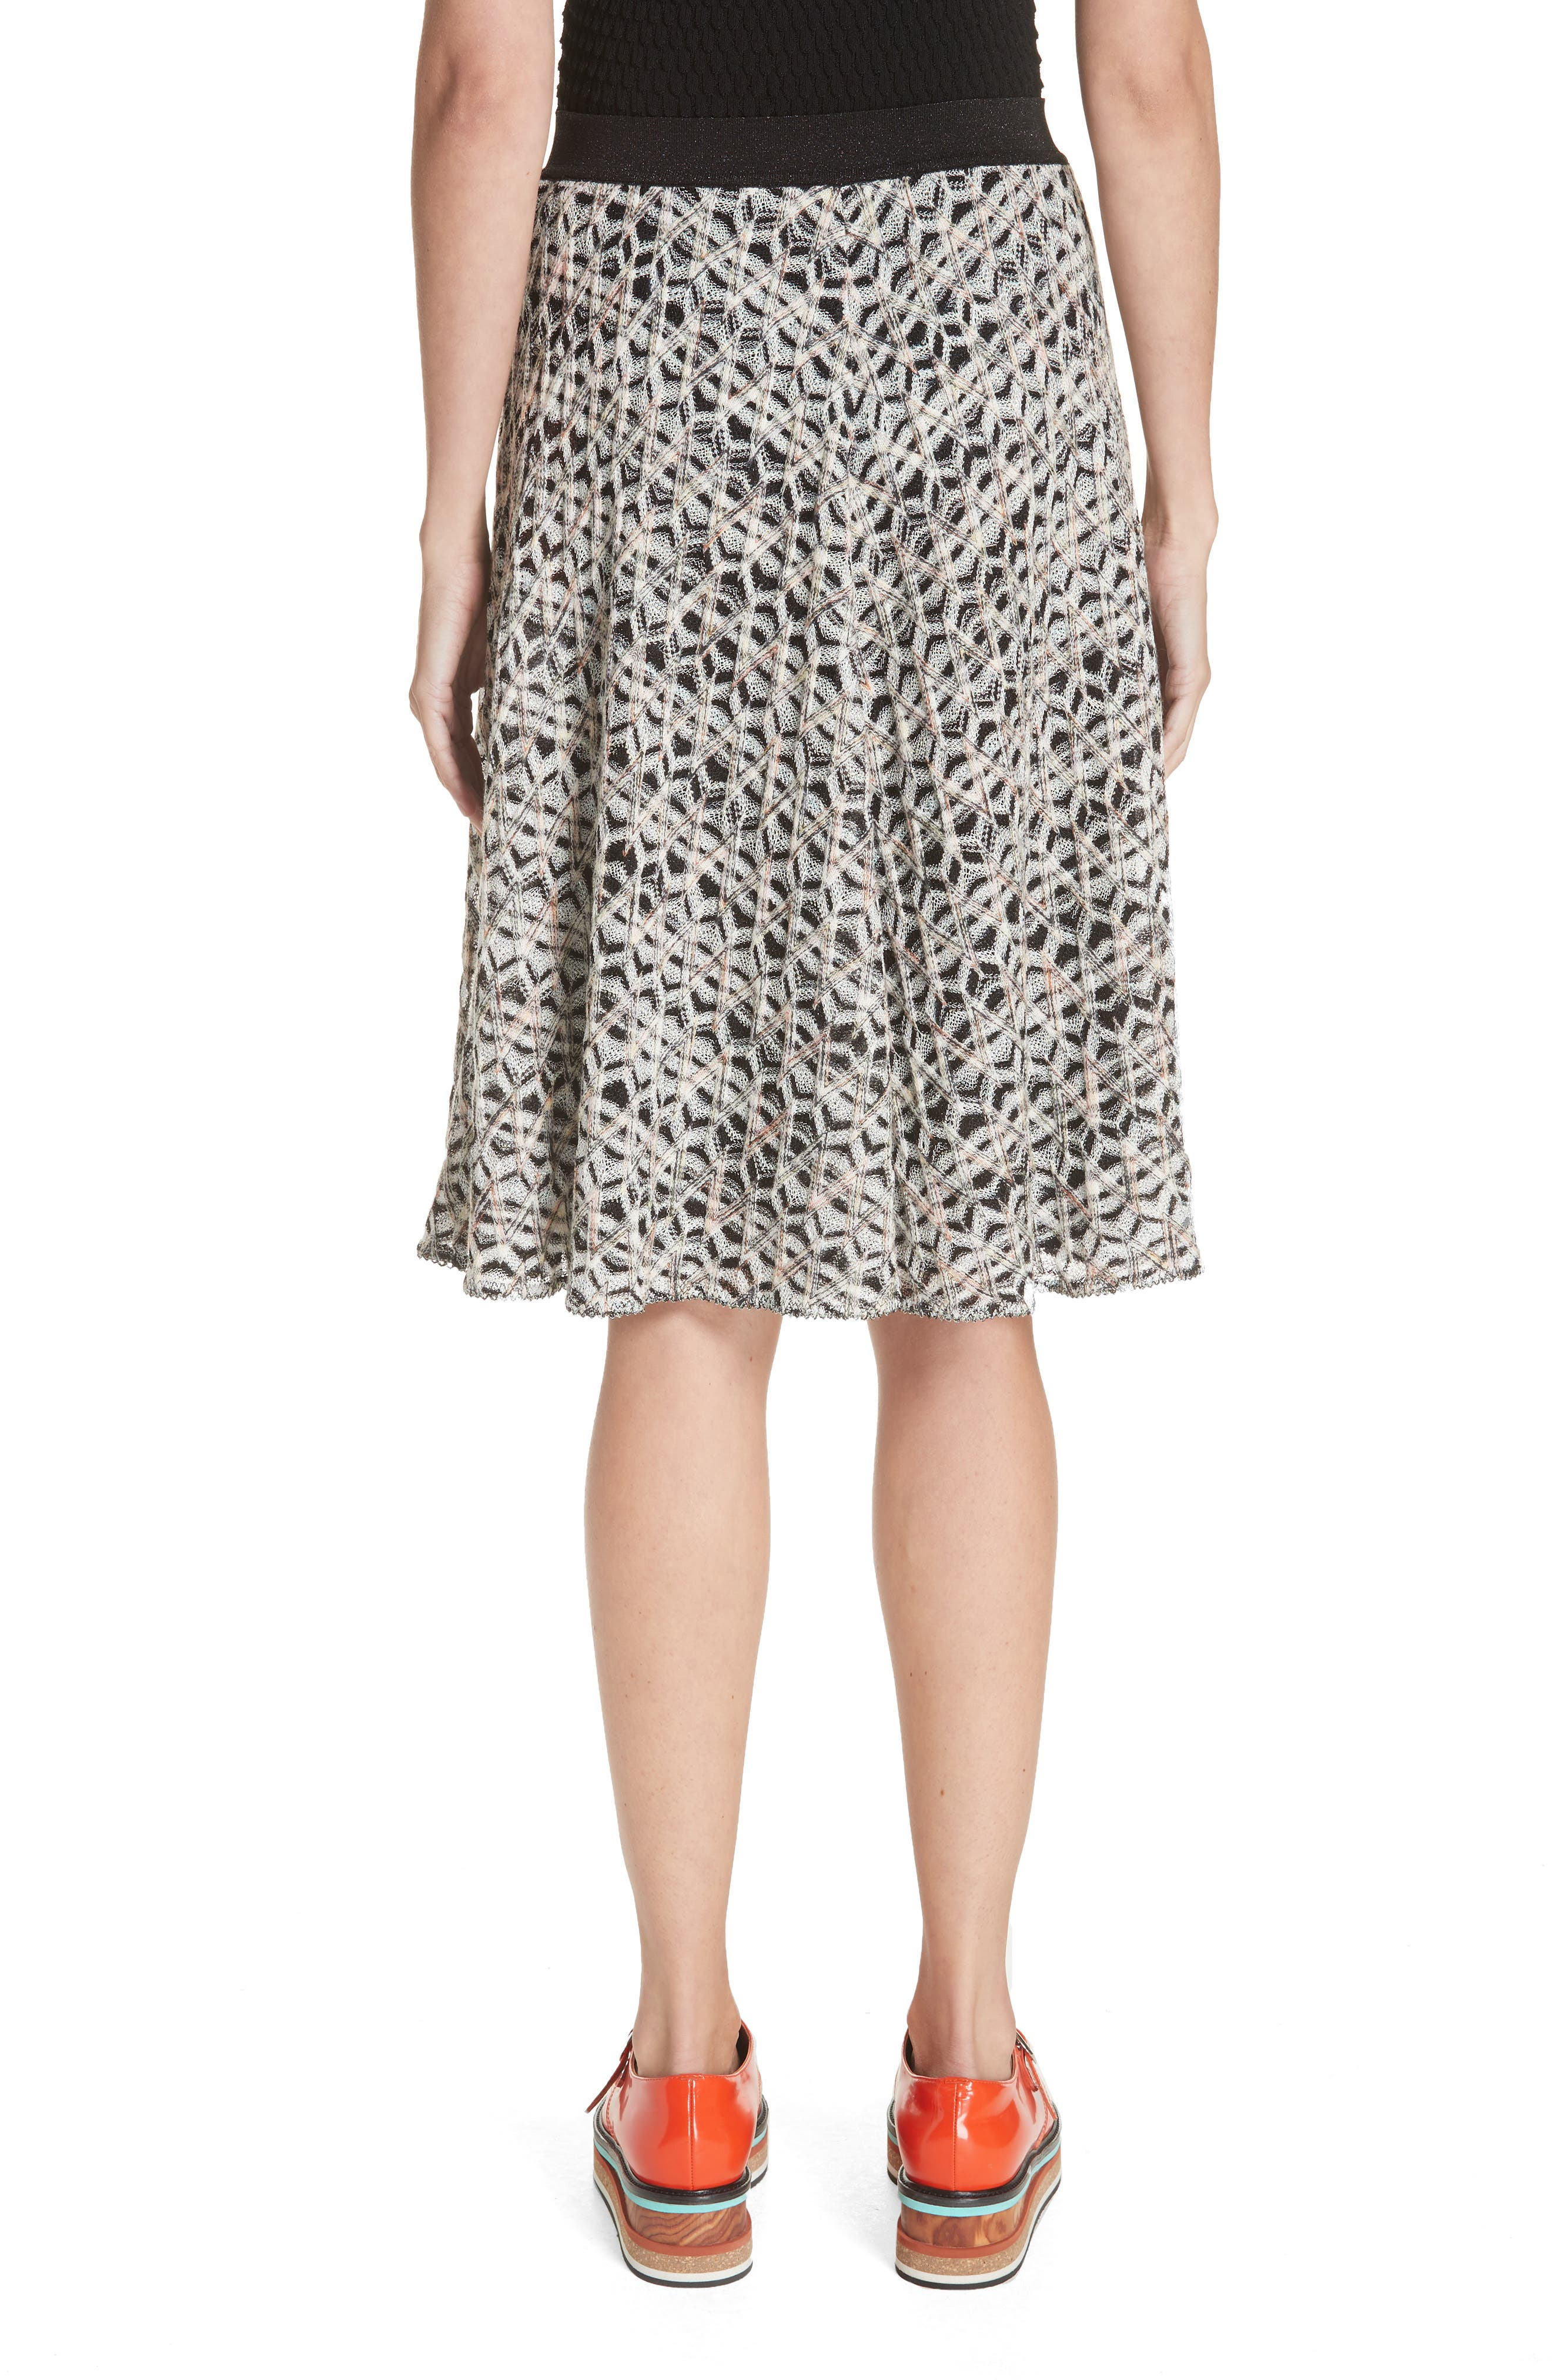 MISSONI, Zig Zag A-Line Skirt, Alternate thumbnail 2, color, MULTI